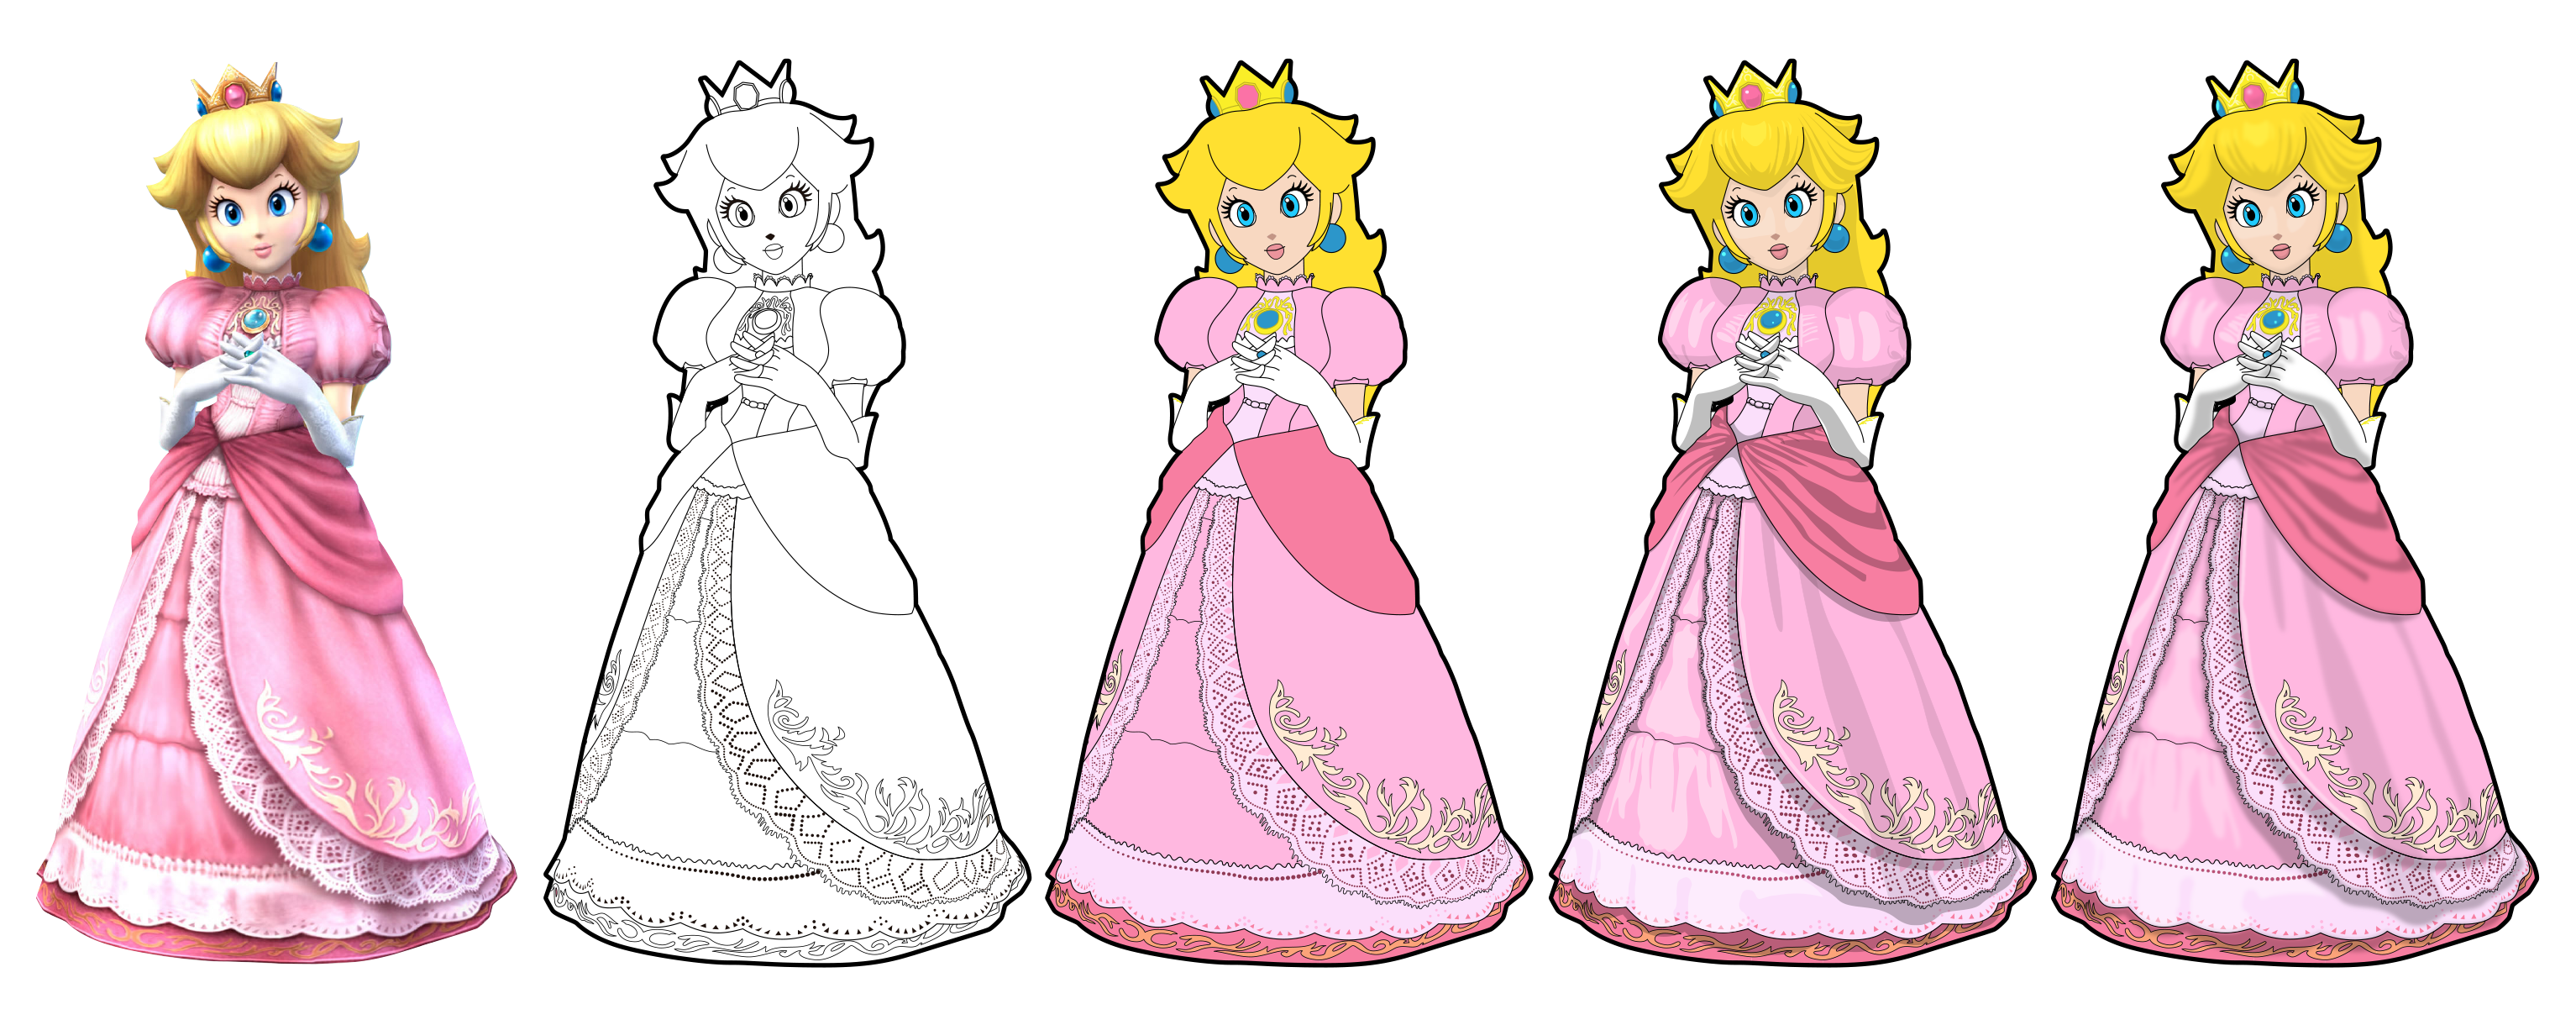 Princess Peach Vector Drawing by Juliannb4